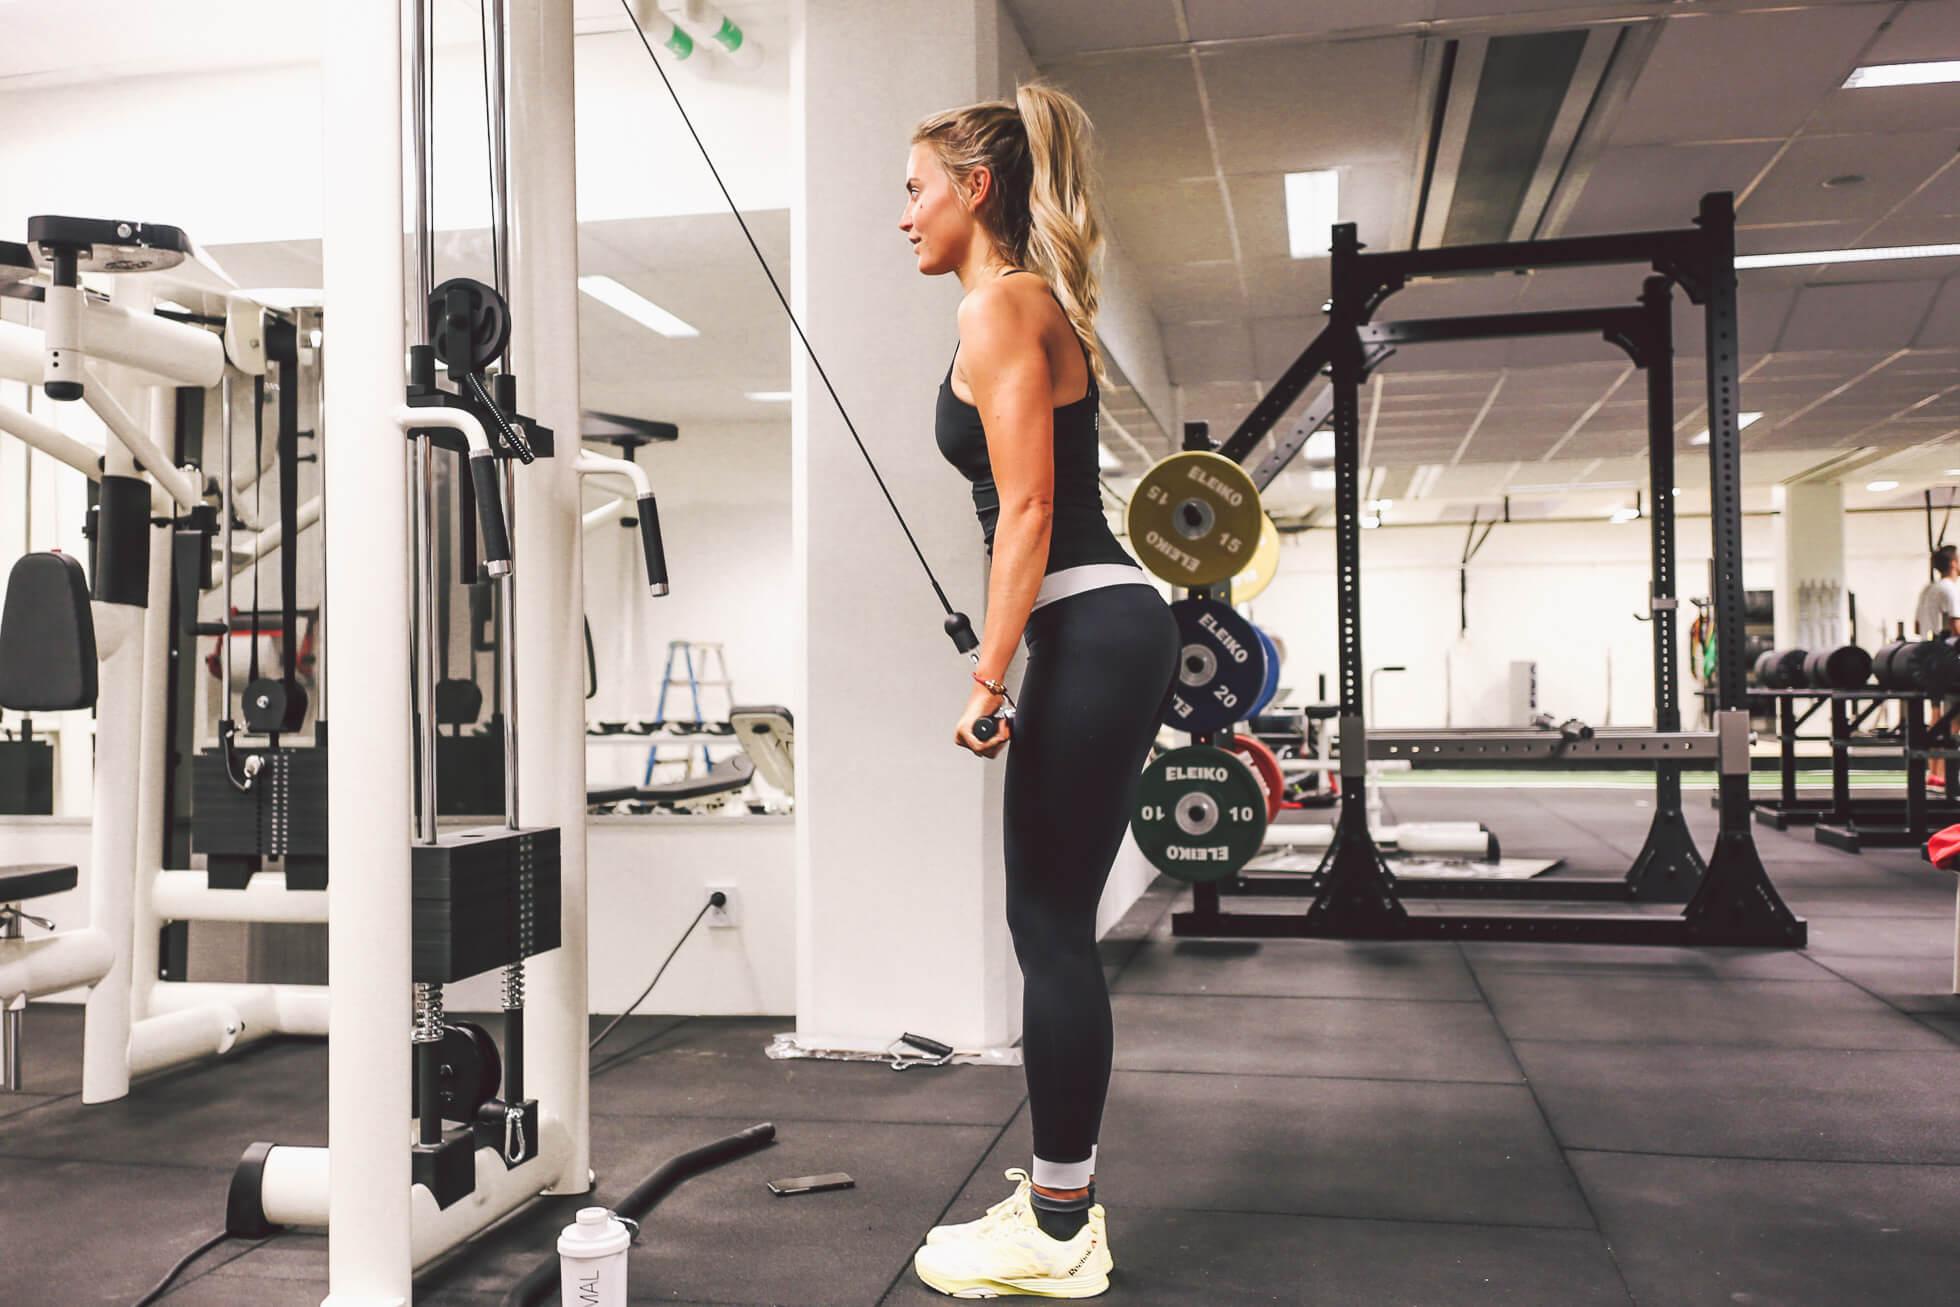 janni-deler-workout-buddyalexandra-bring-janni-deler-8